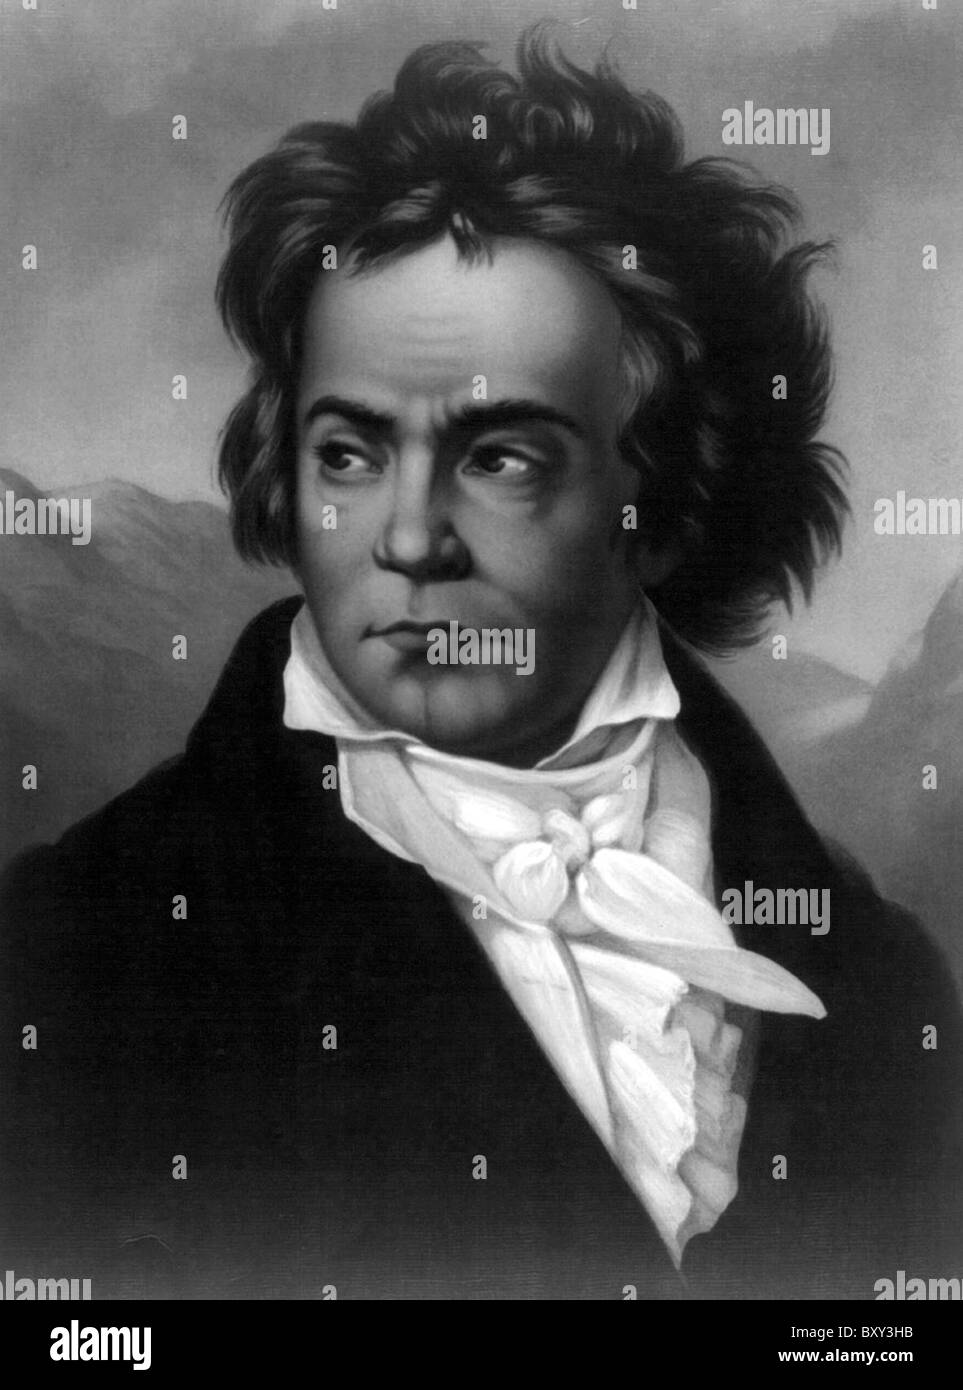 Beethoven, Ludwig van Beethoven, German composer and pianist. - Stock Image